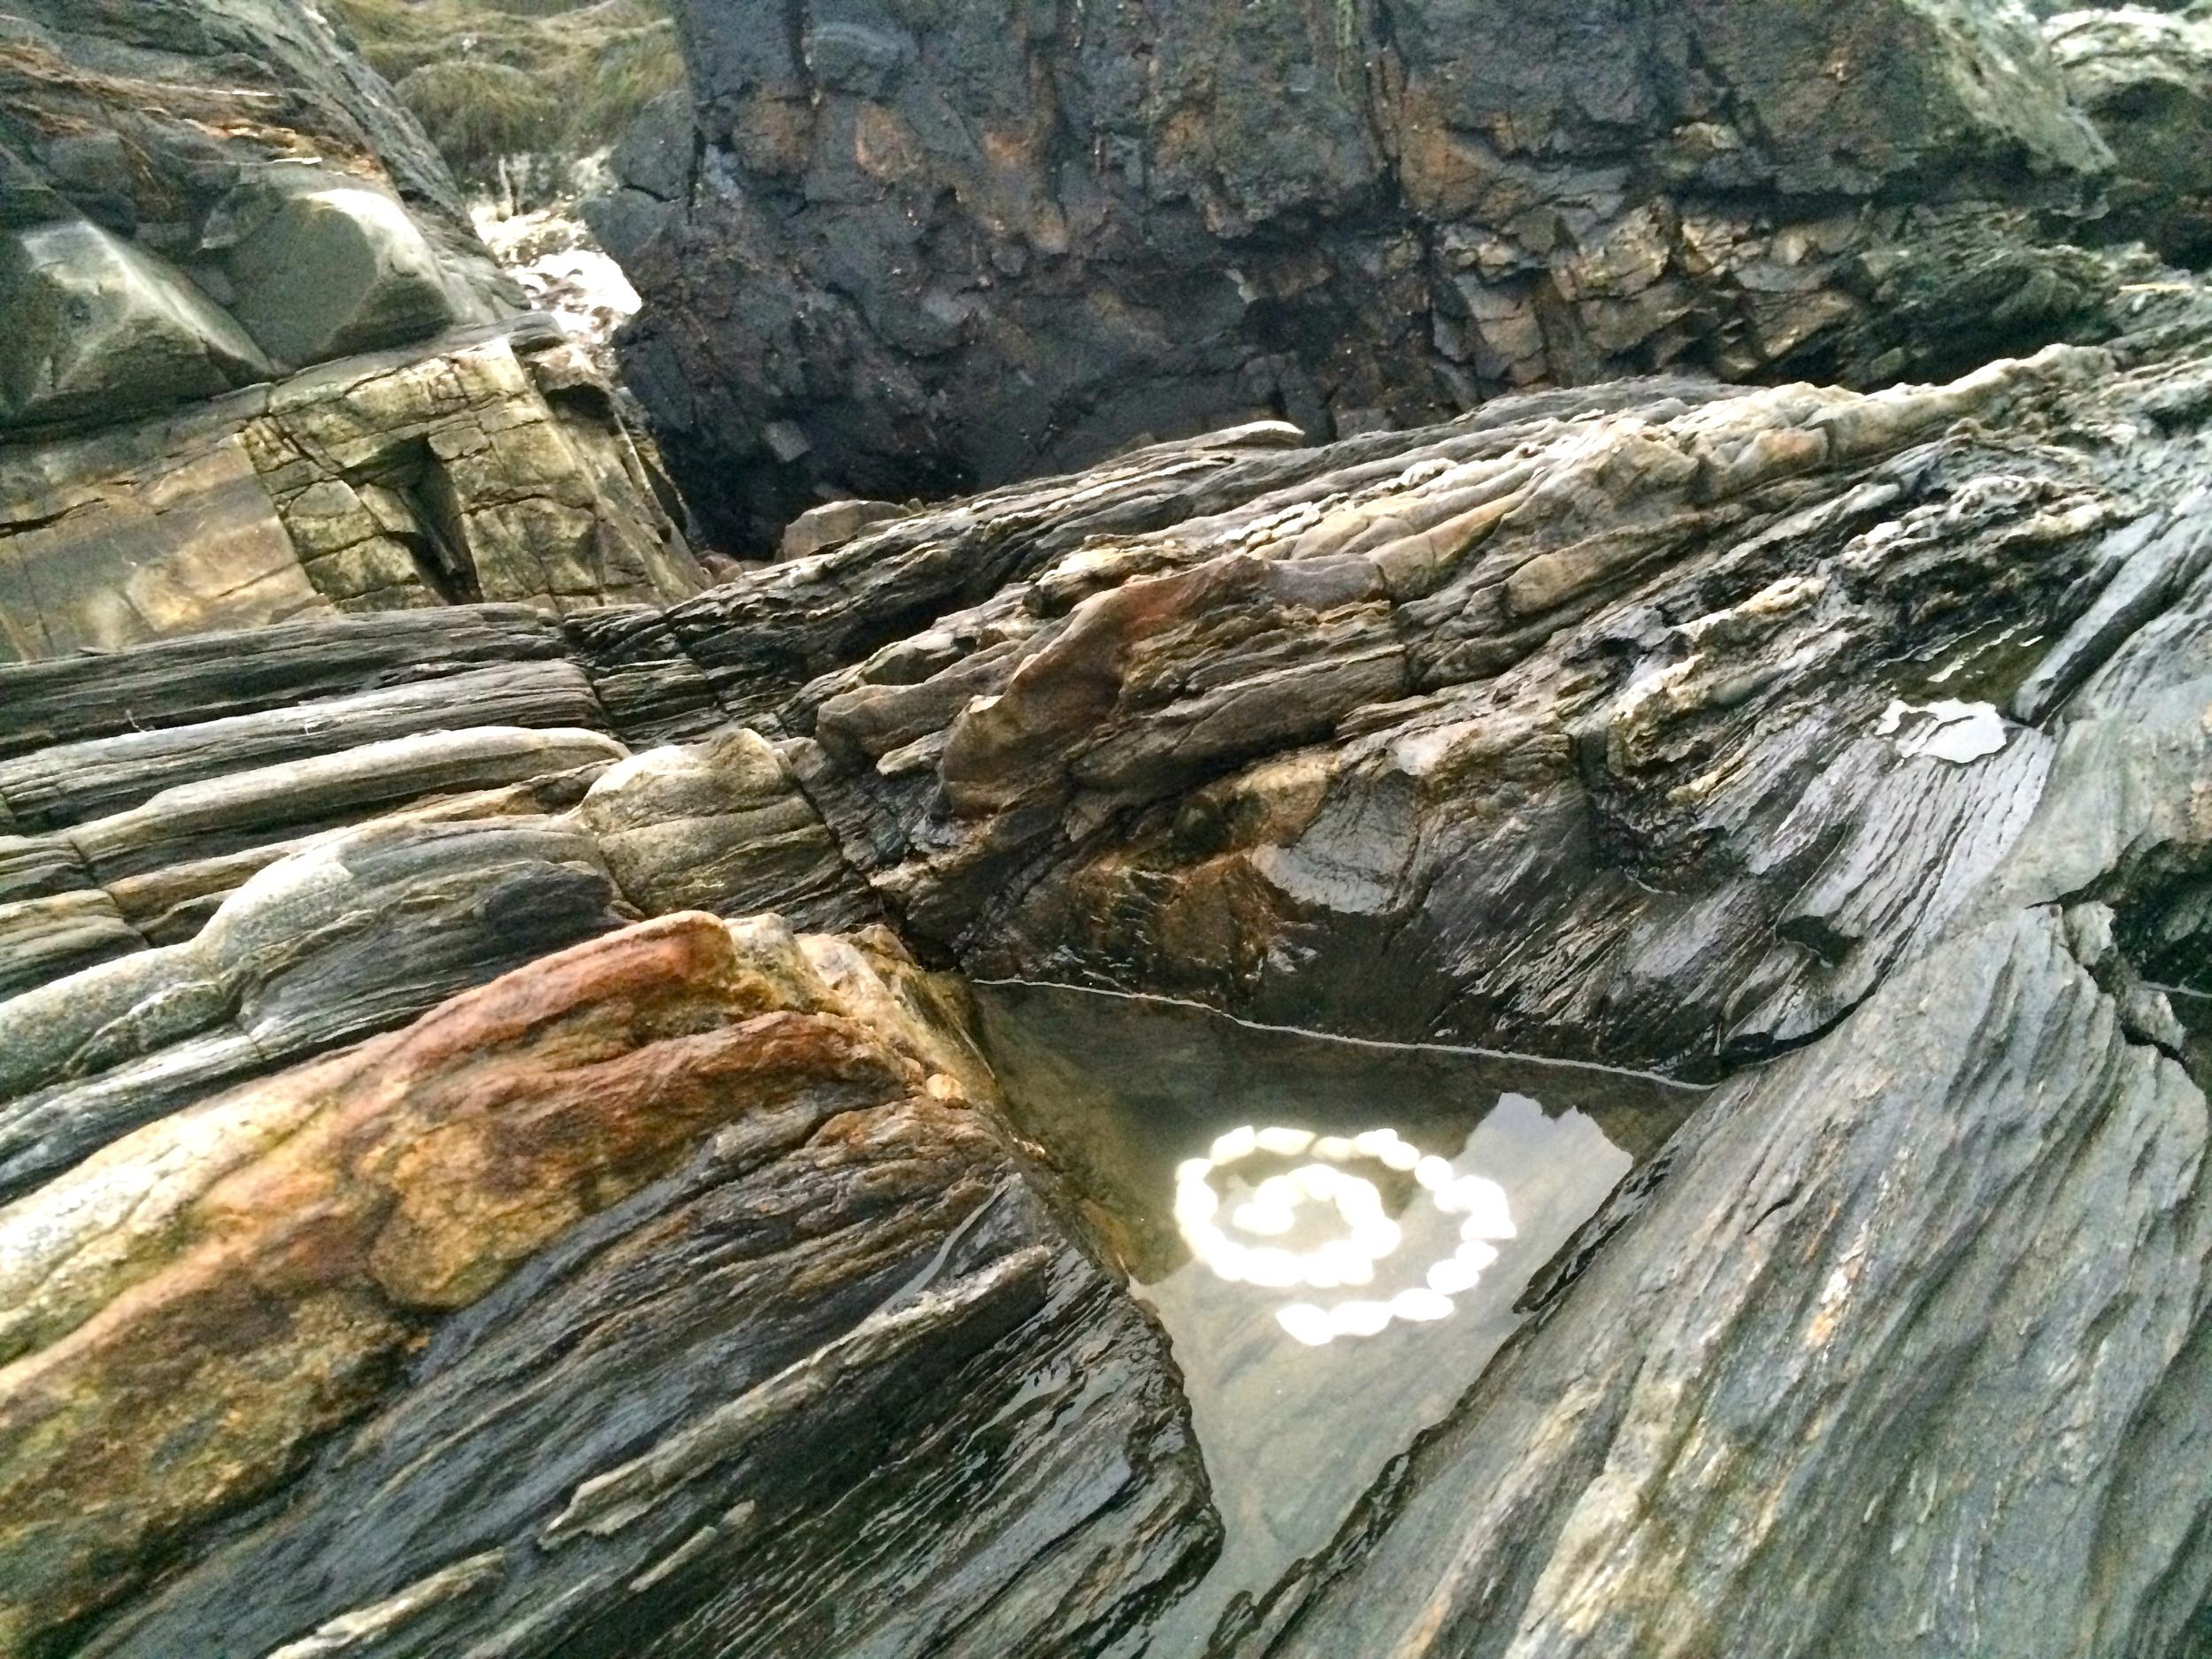 Equilateral     Cape Elizabeth, Me. 2014